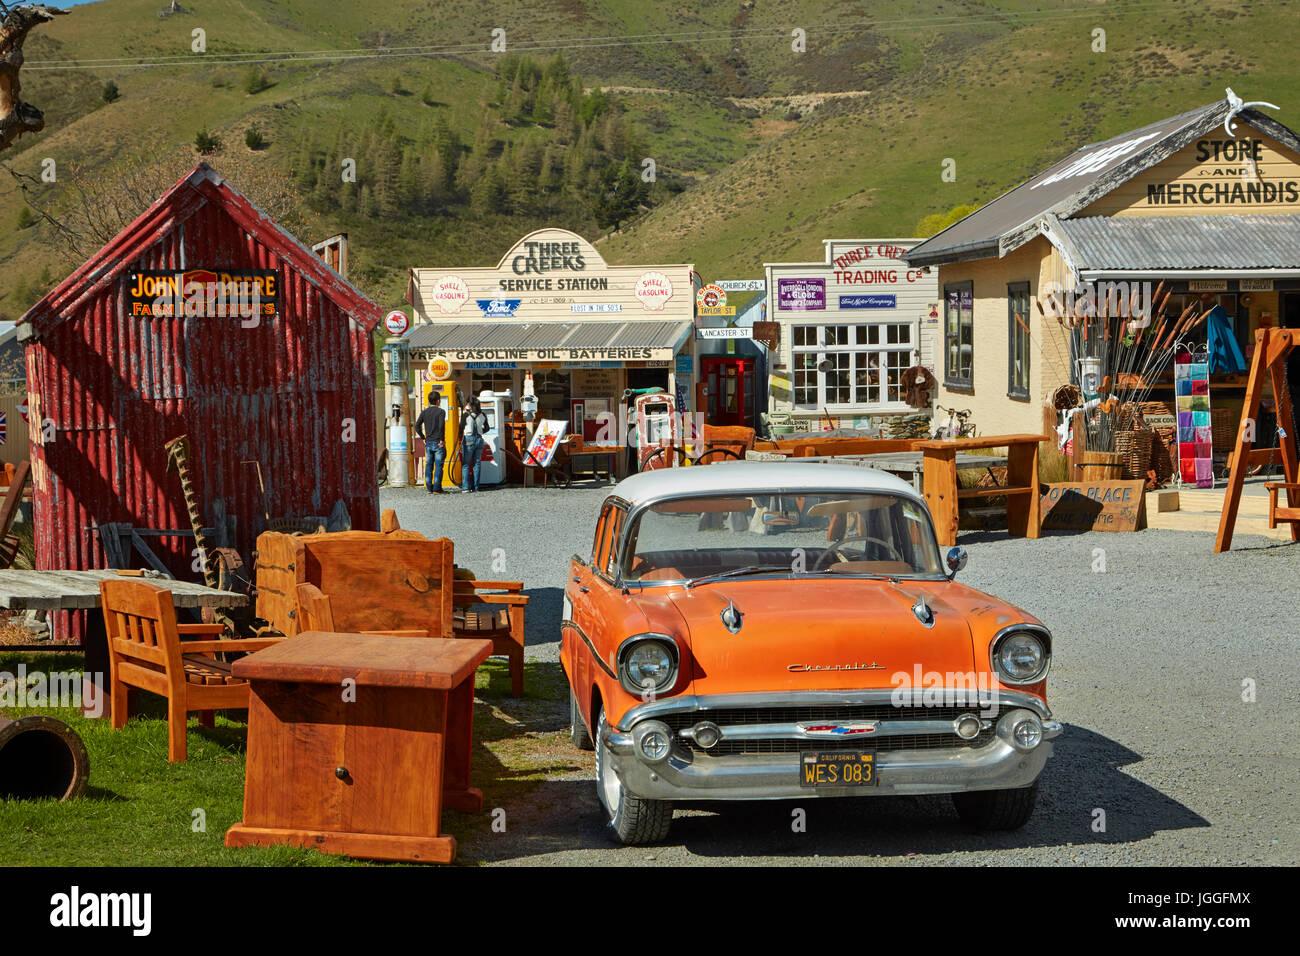 1957 Chevrolet at Three Creeks Trading Company, Burkes Pass, Mackenzie Country, Canterbury, South Island, New Zealand - Stock Image